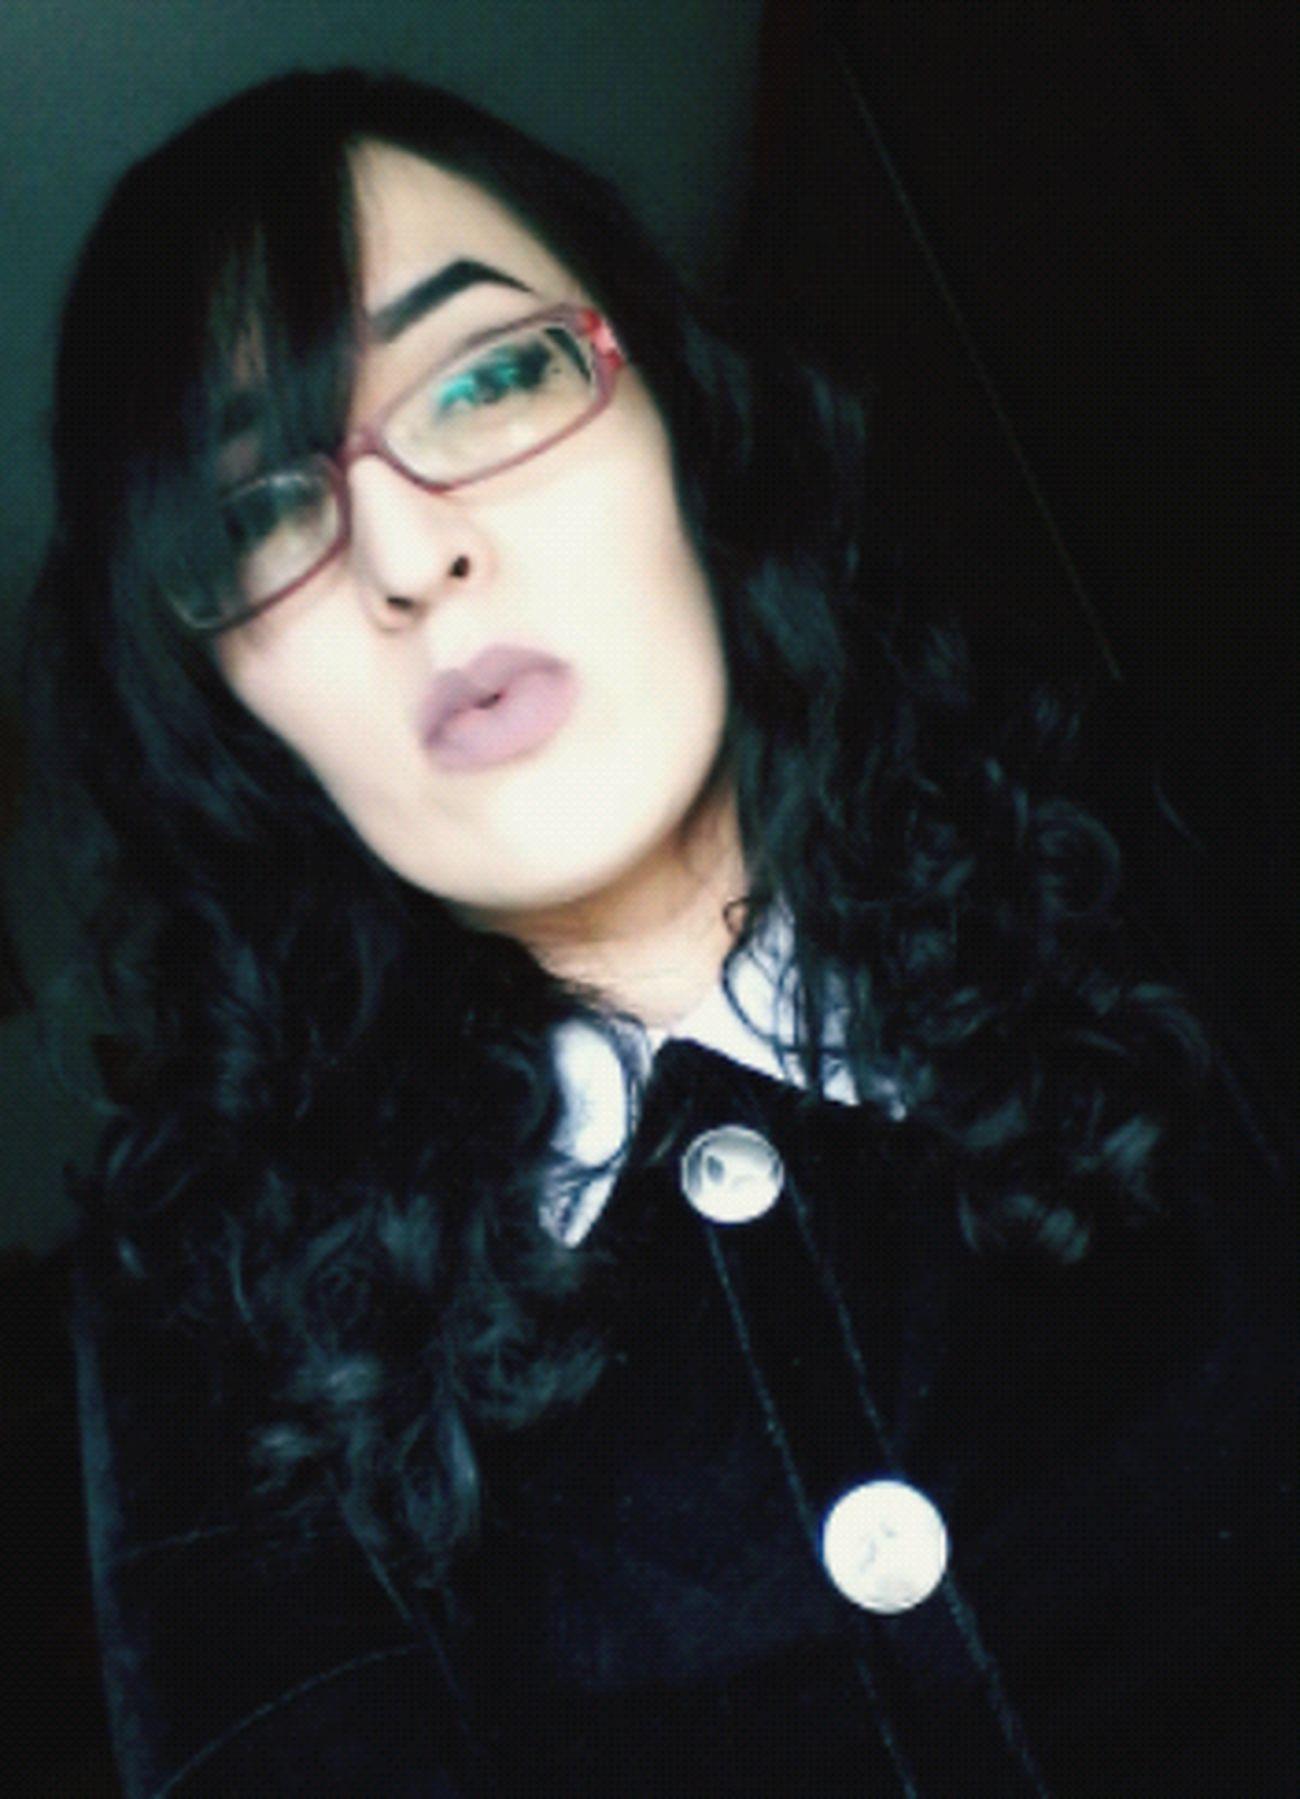 Makeup Makeupartist Makeup ♥ Makeupaddict Trucco Maquillaje Yo Ciao. ✌ Hola! ✋ Hello World ✌ That's Me✌️